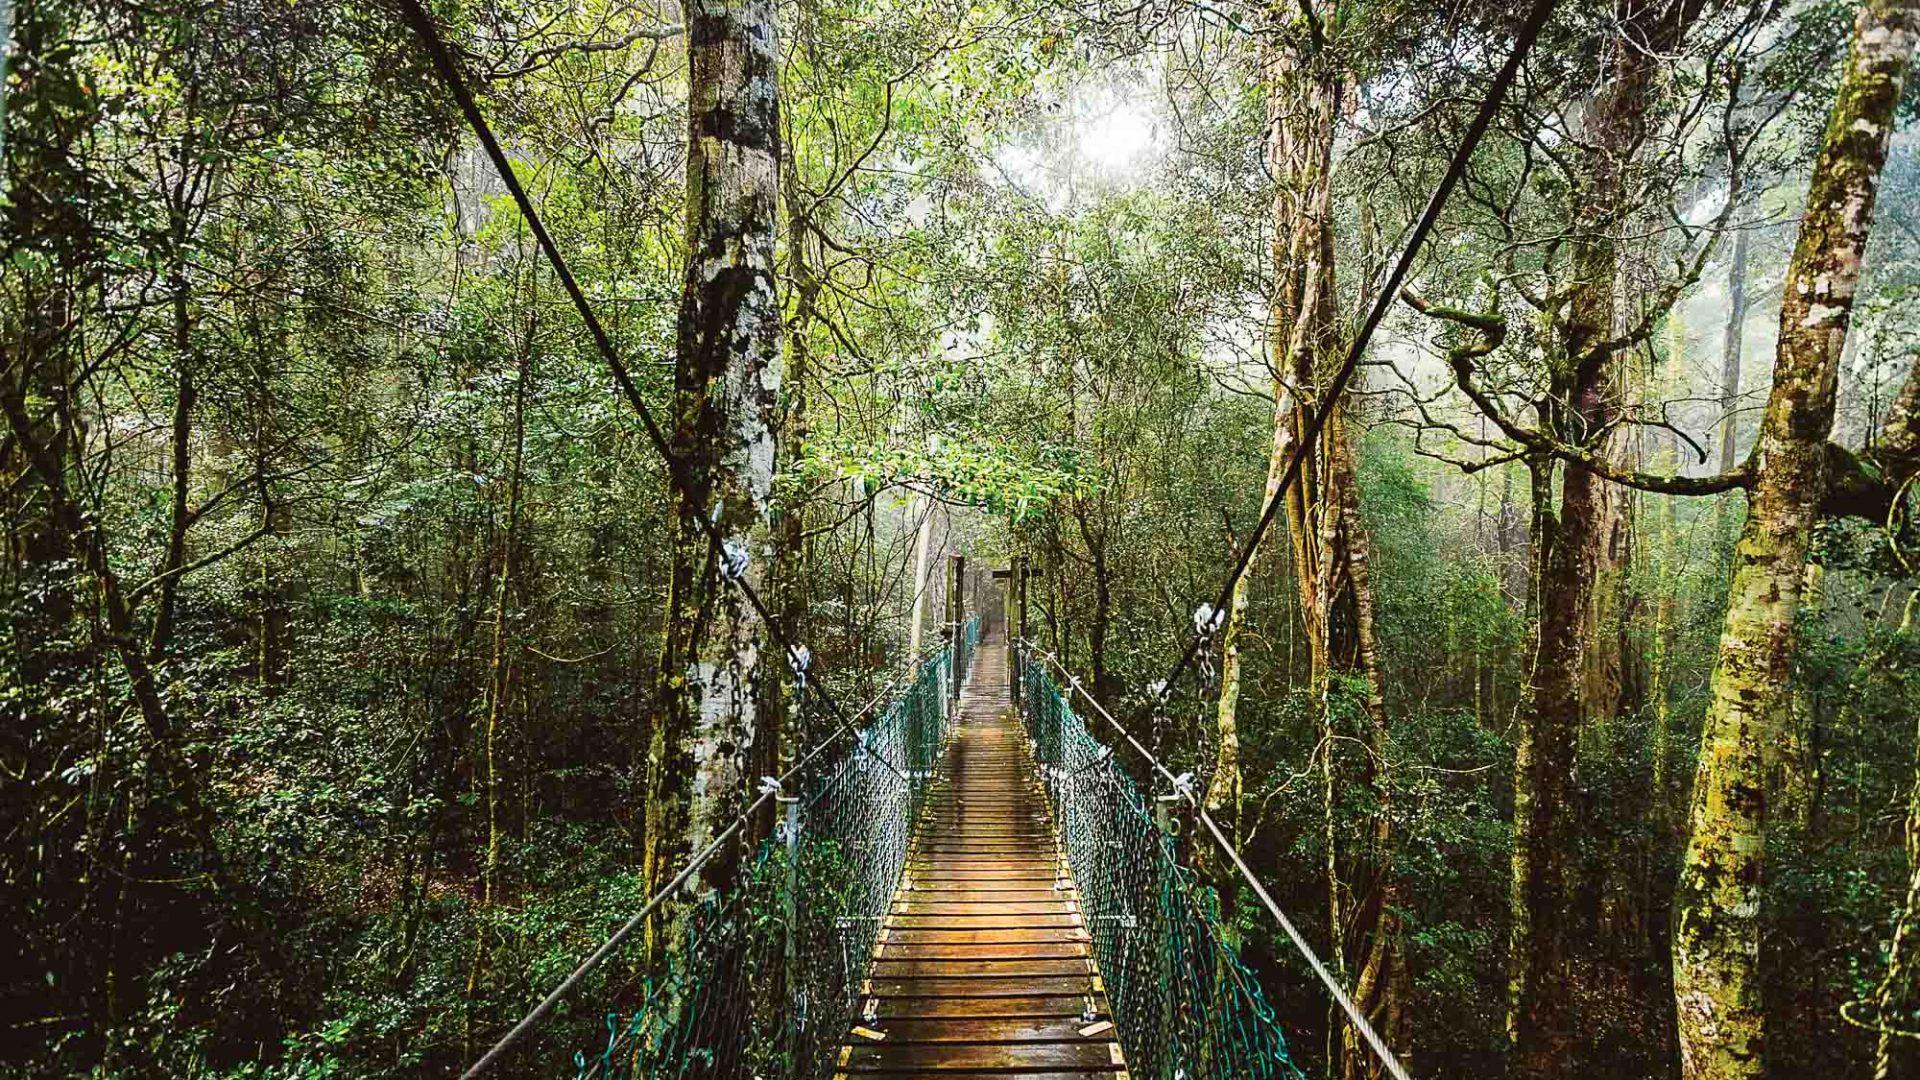 A wooden boardwalk through forest.